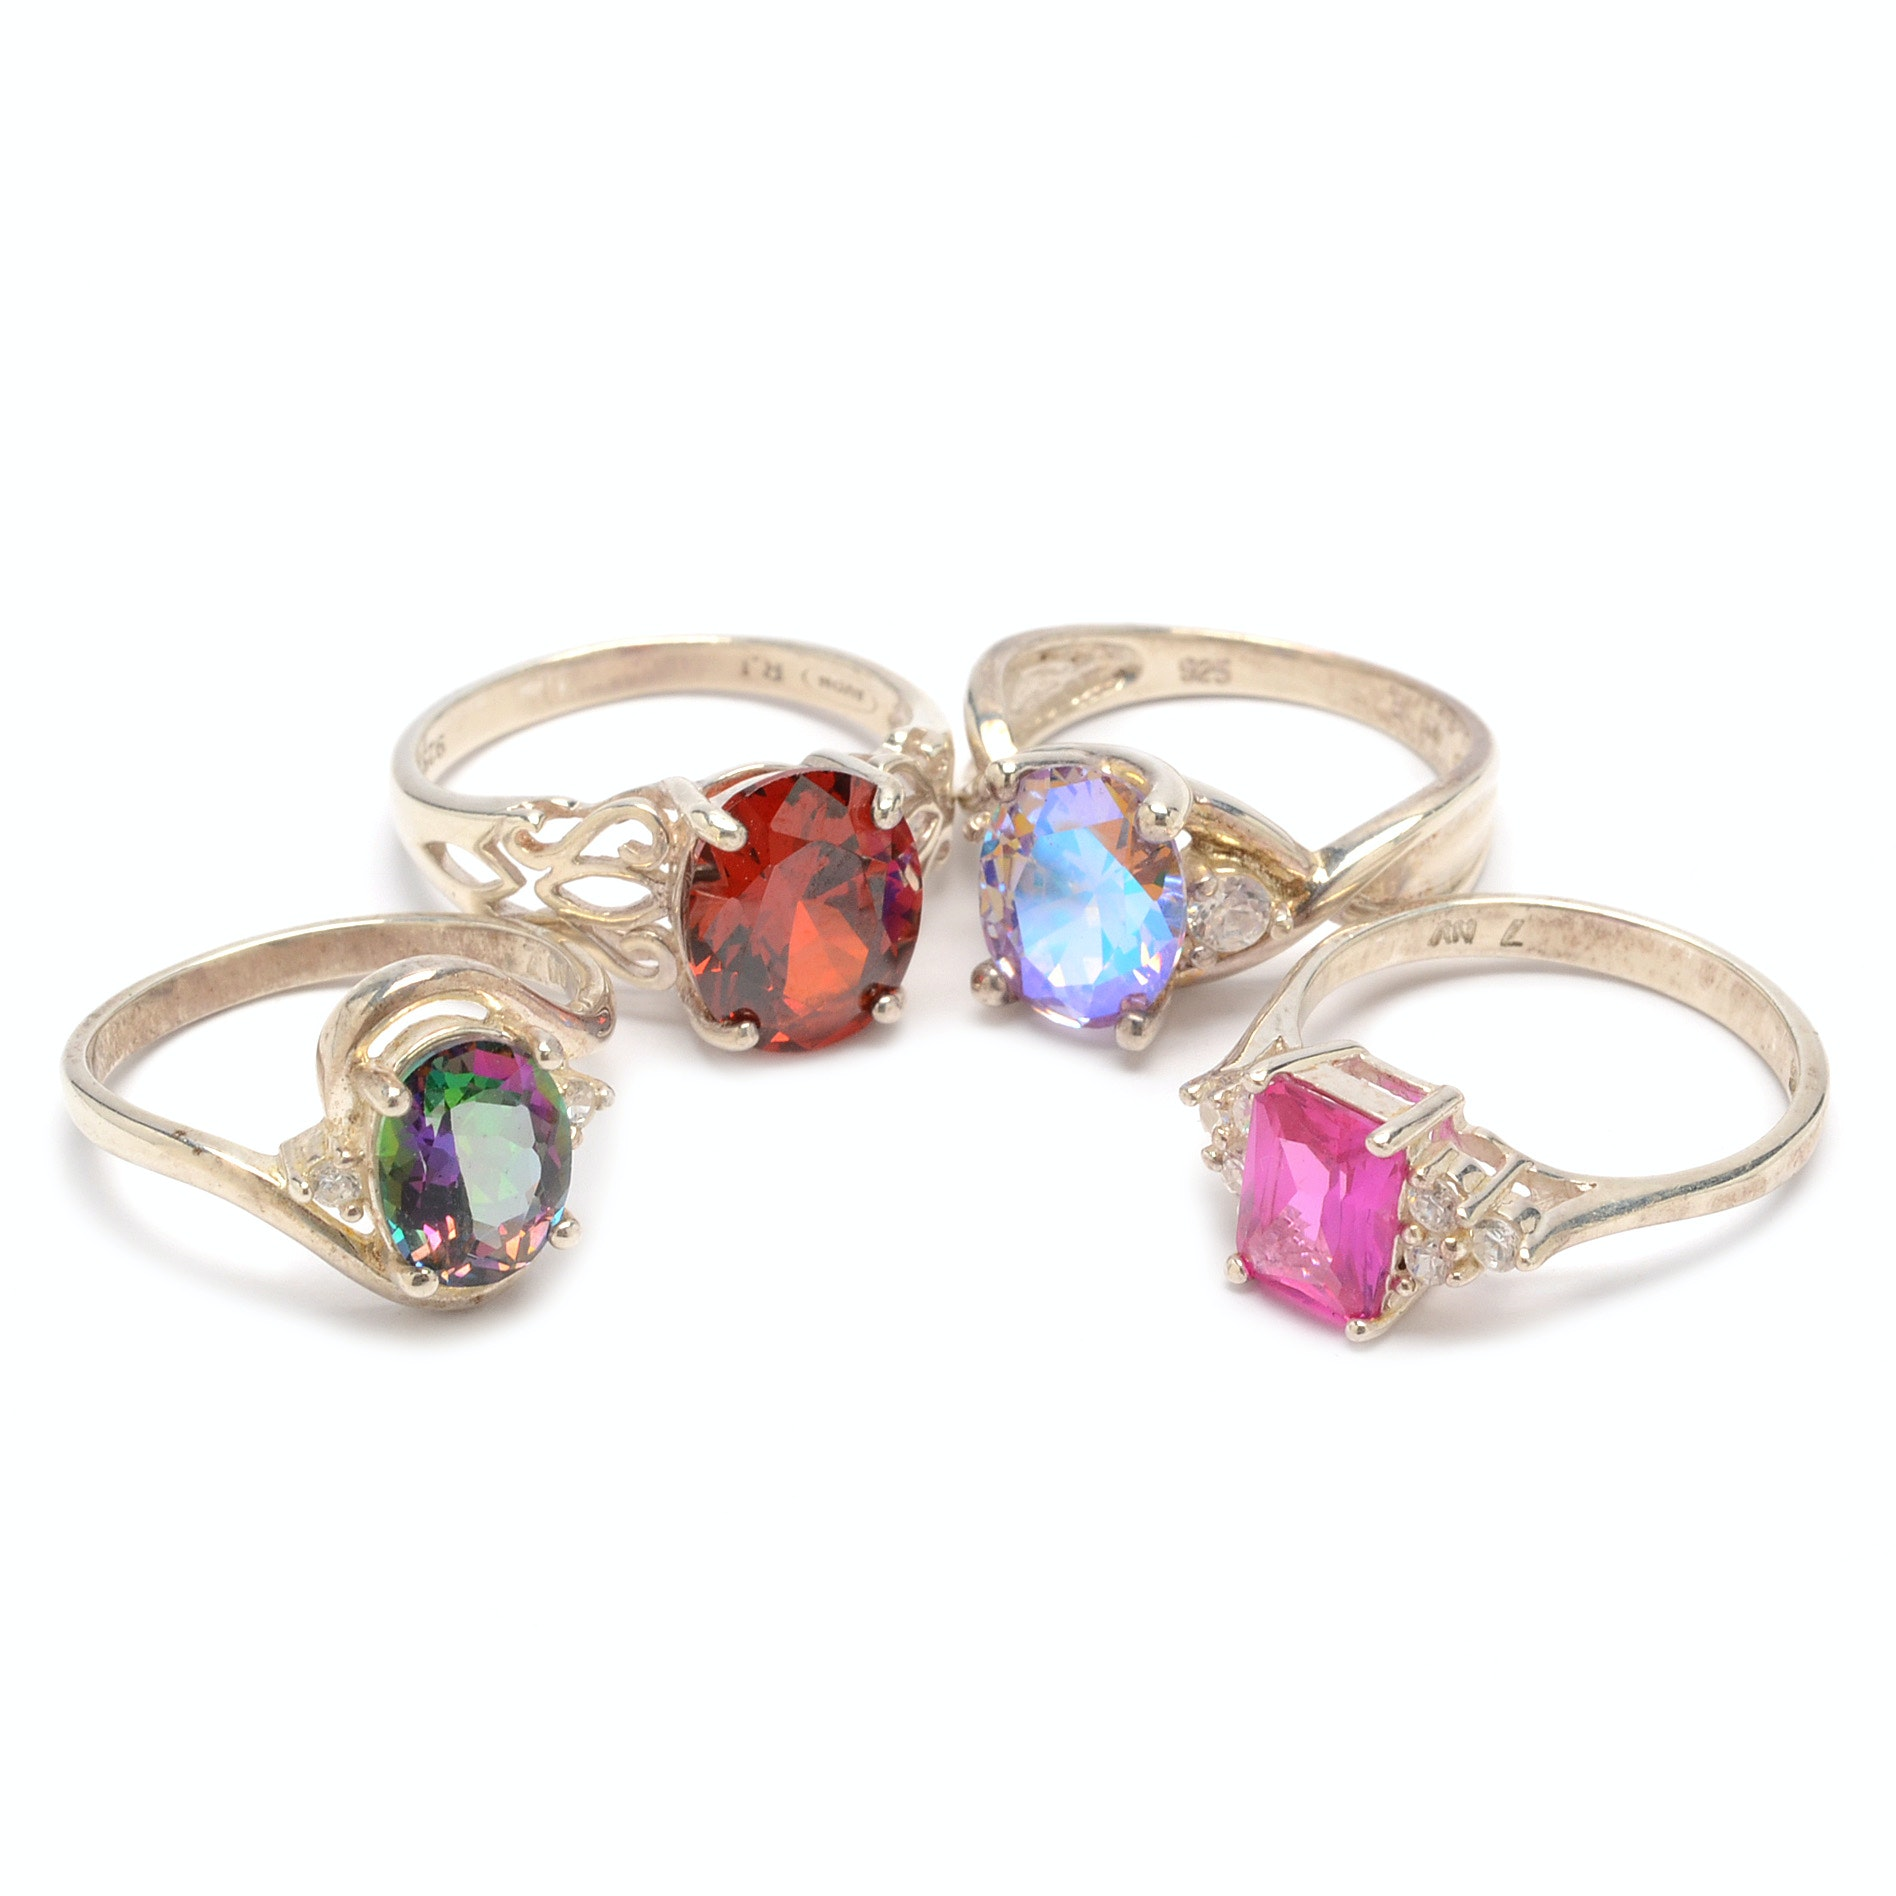 Sterling Silver Gemstone Rings, Including Garnet